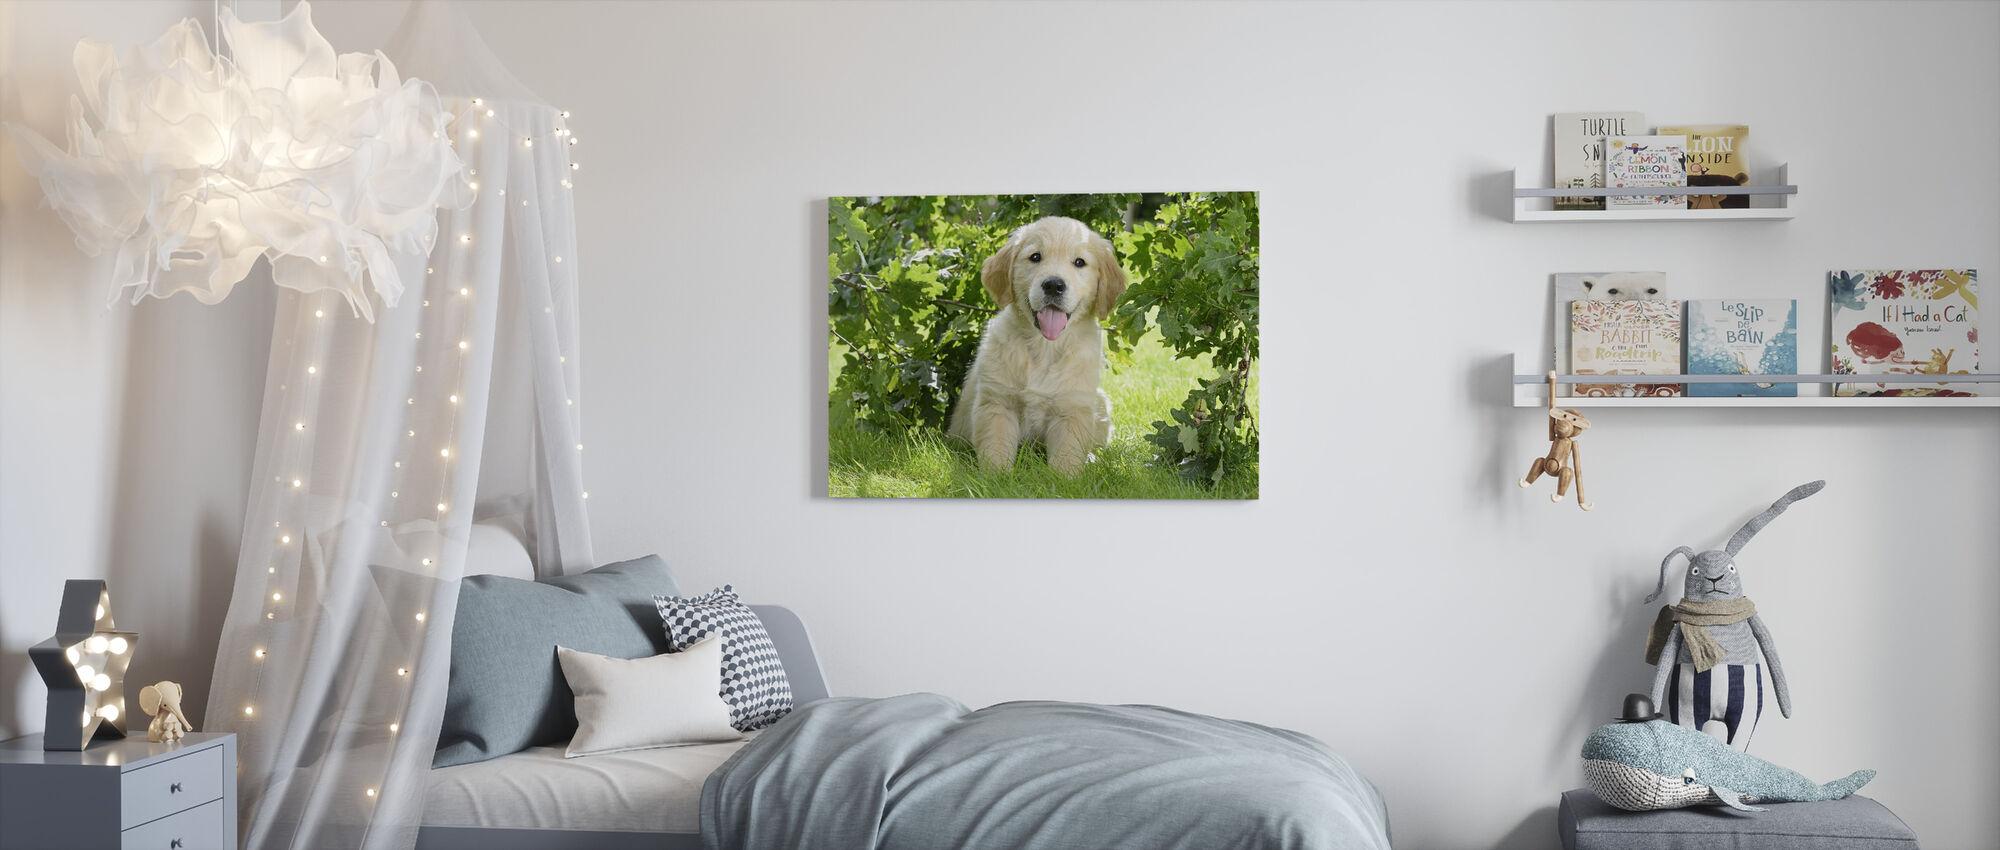 Golden Retriever Puppy - Canvas print - Kids Room